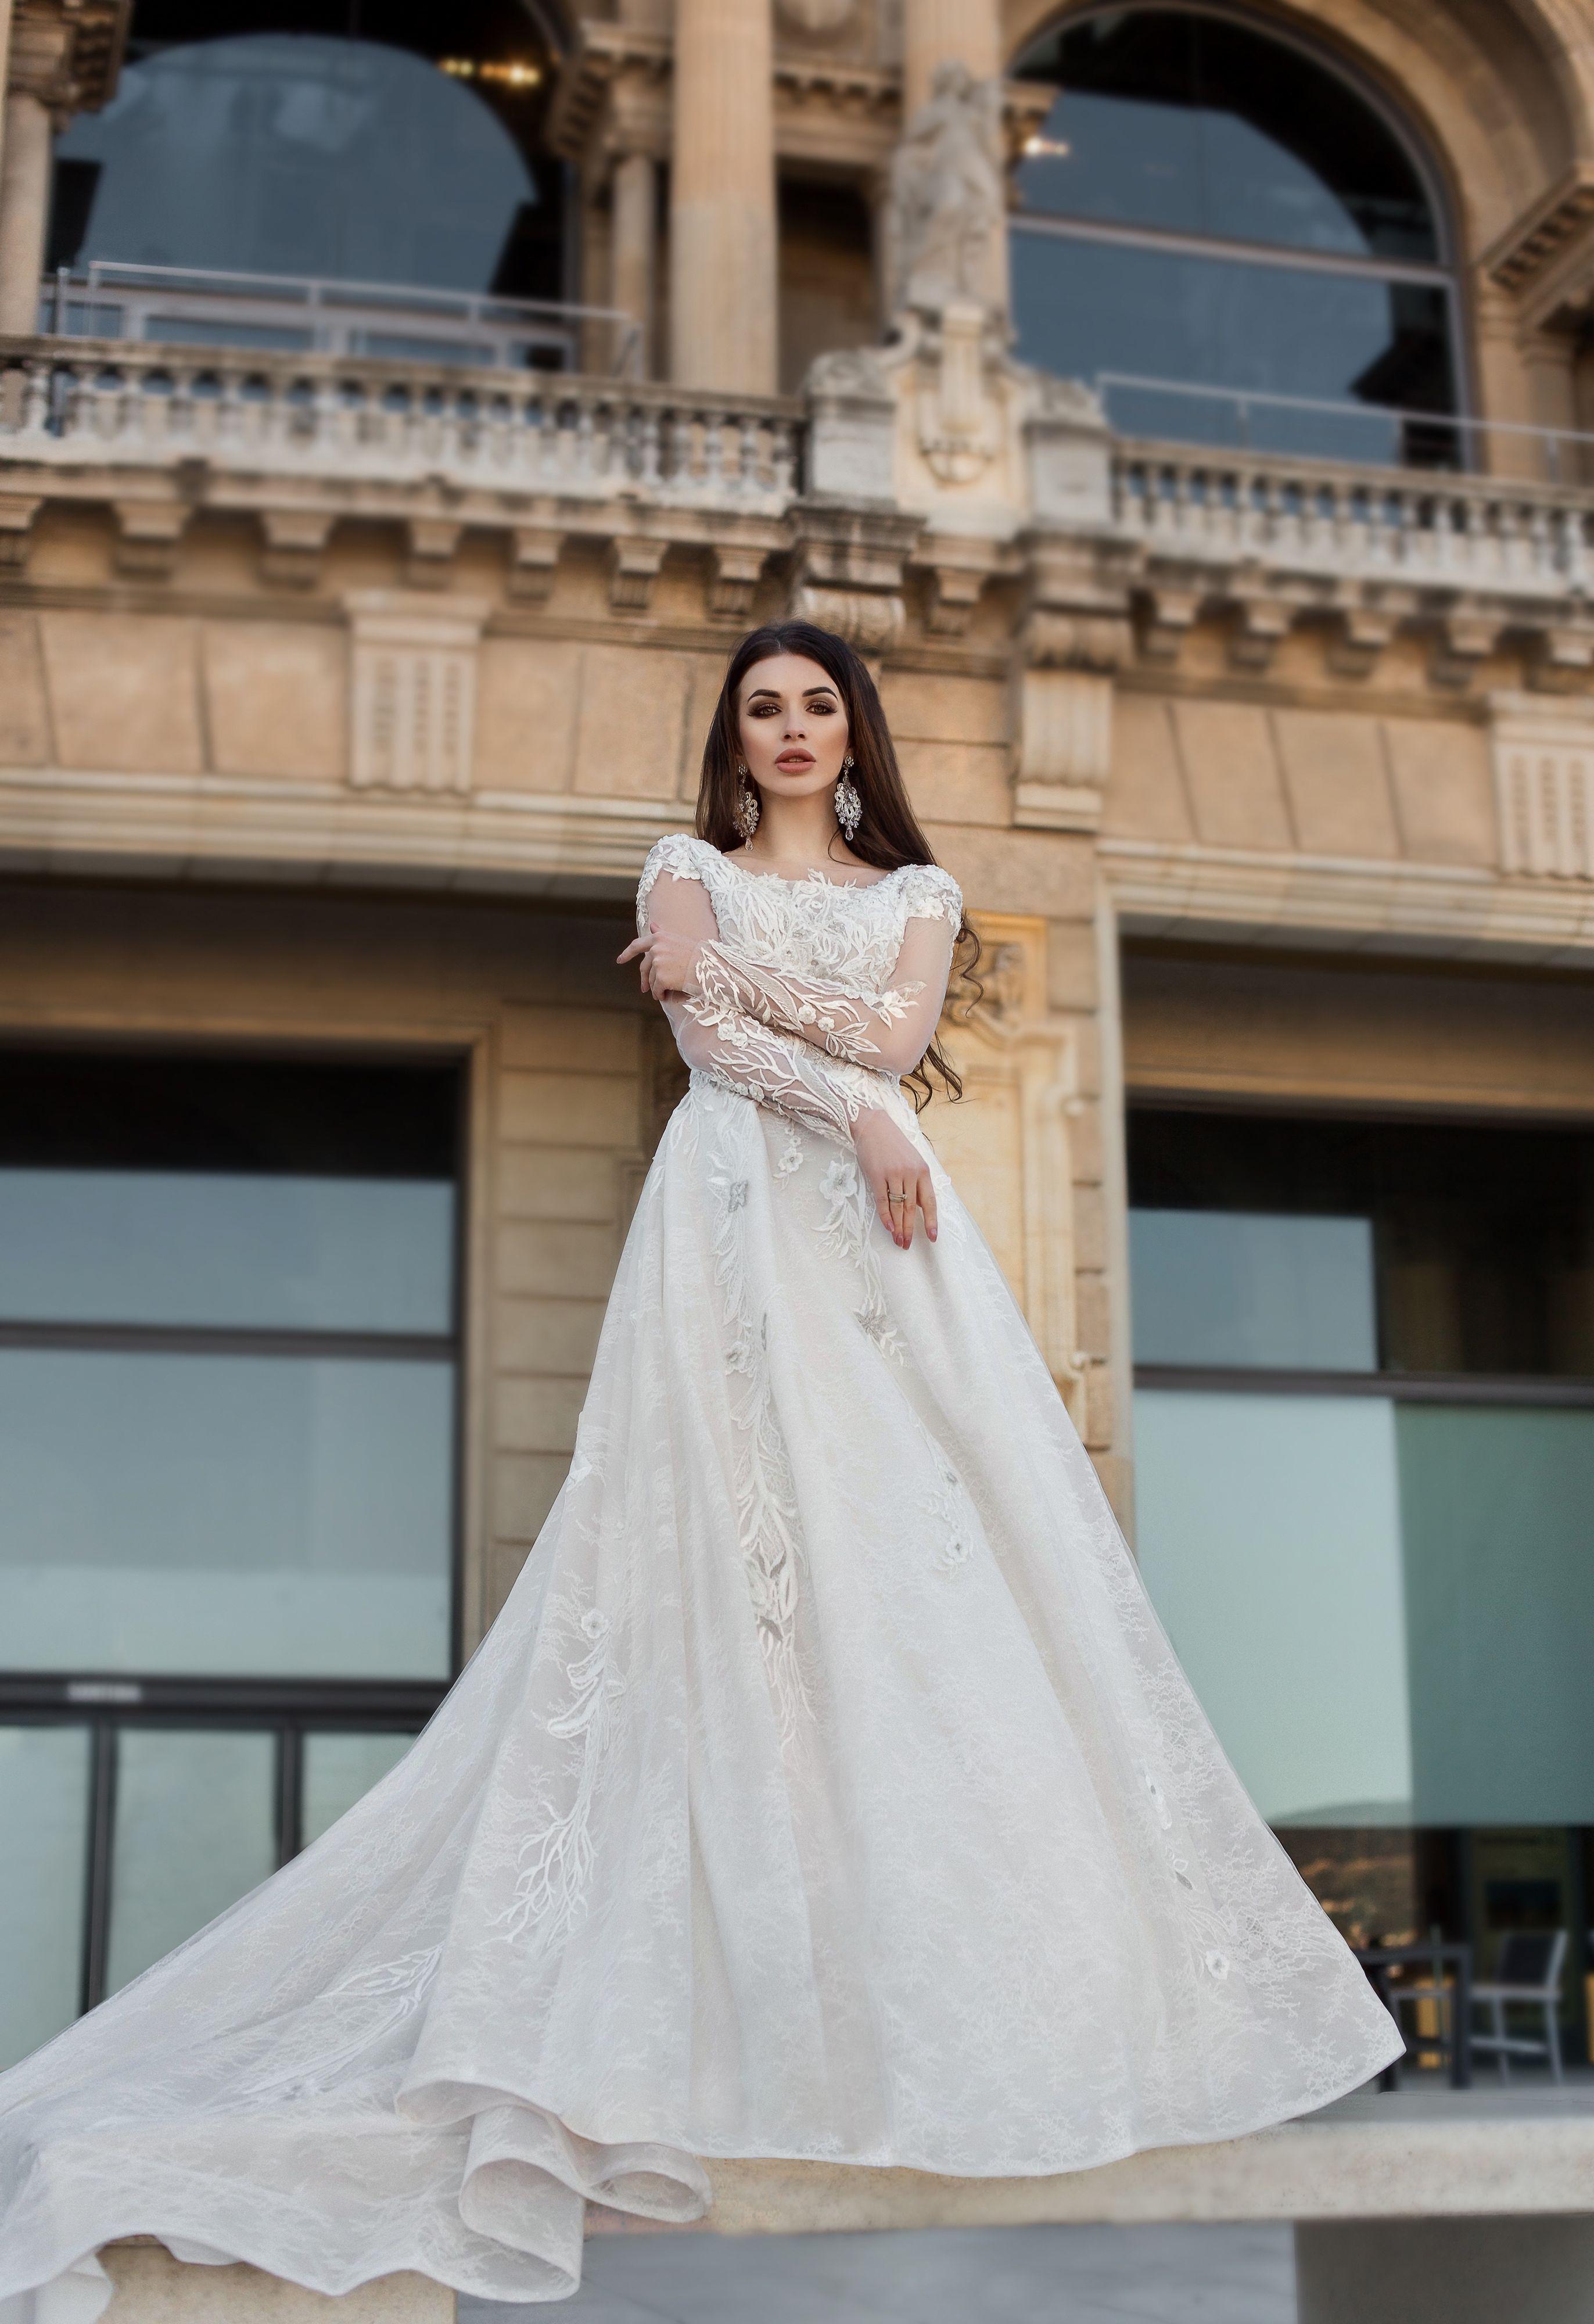 Elegant plus size wedding dress in Massachusetts